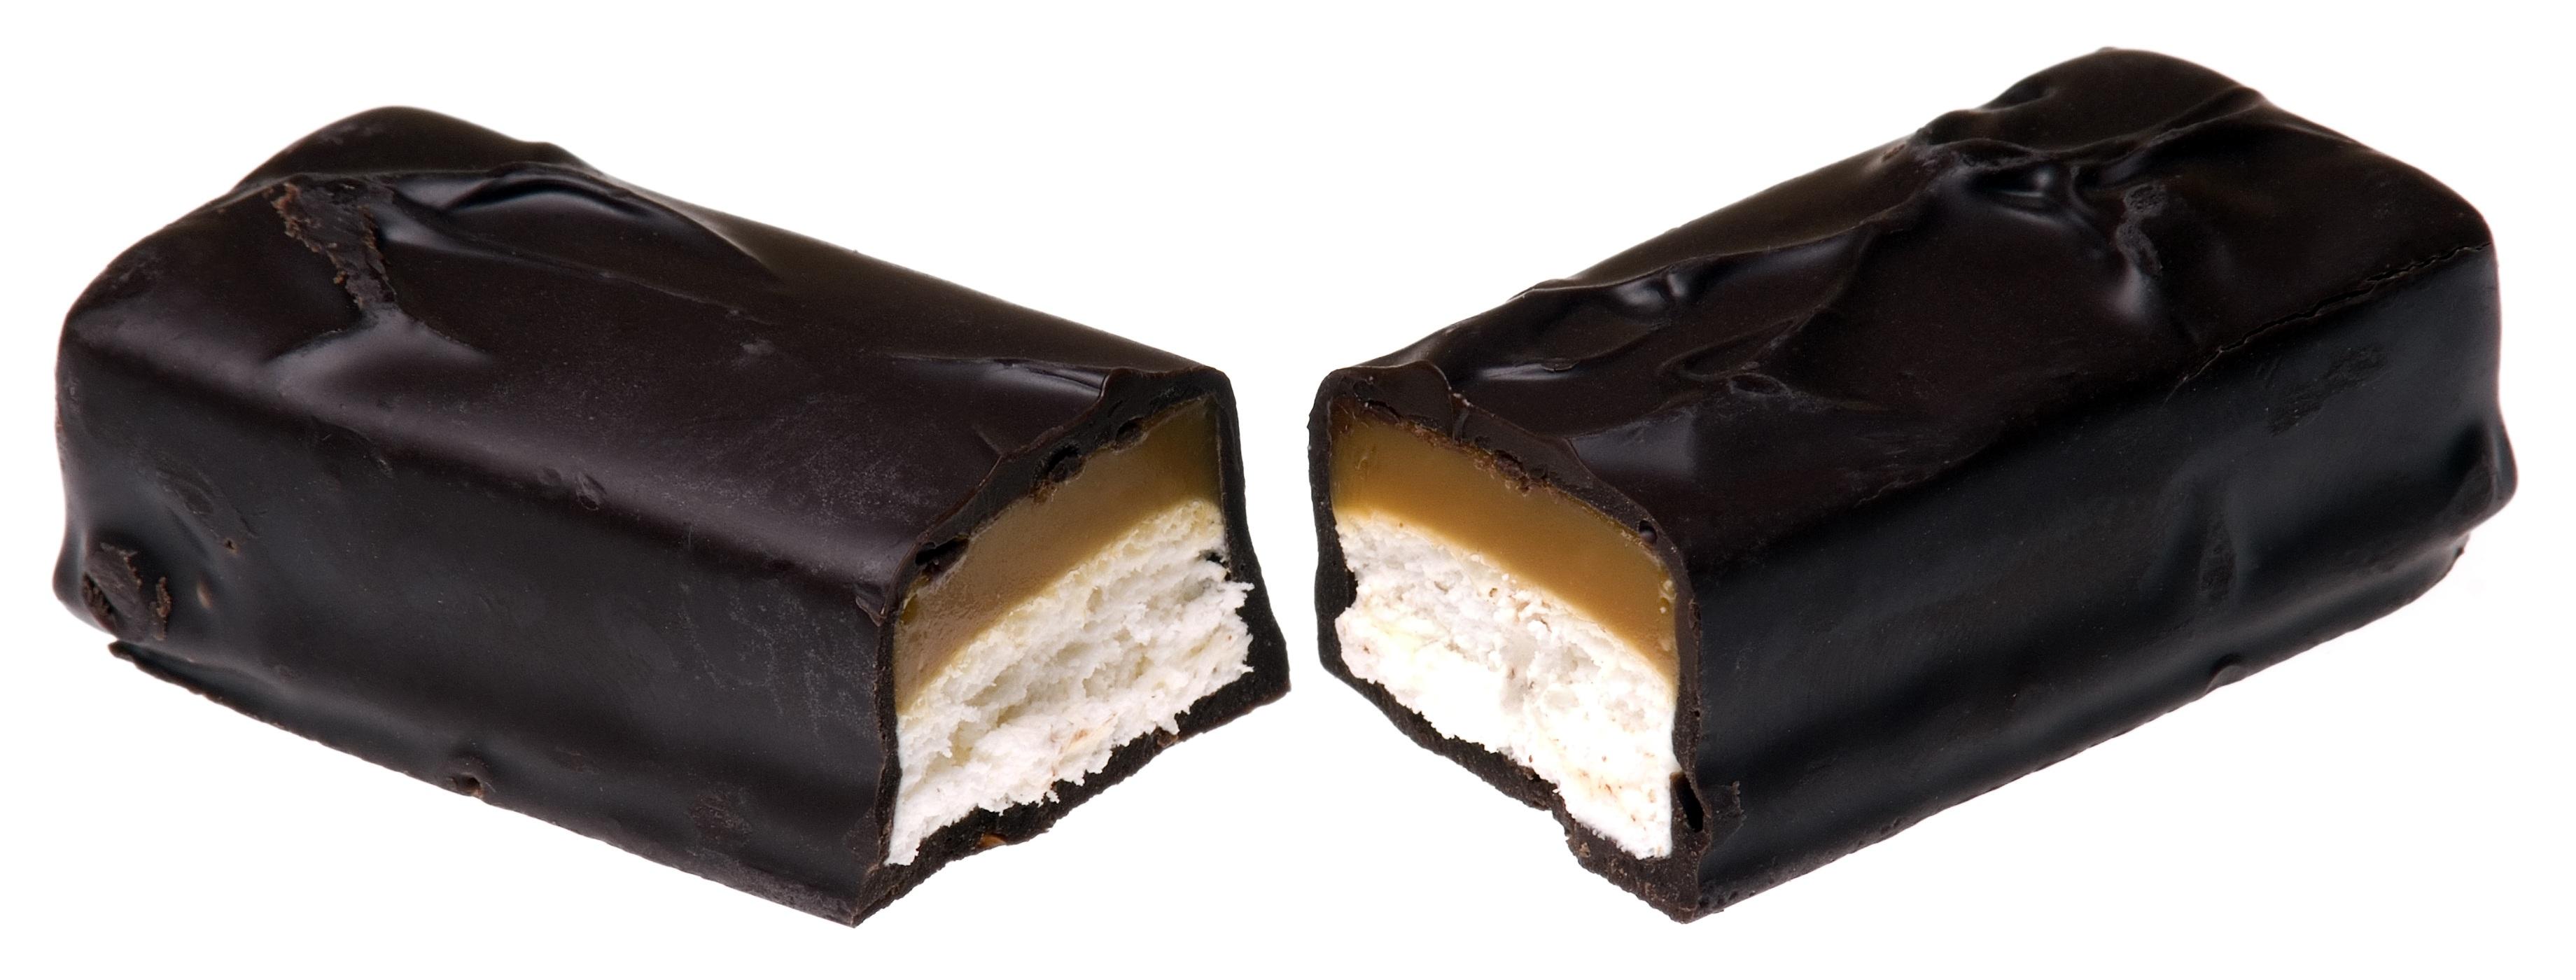 Free Images Sweet Milky Way Dark Food Dessert